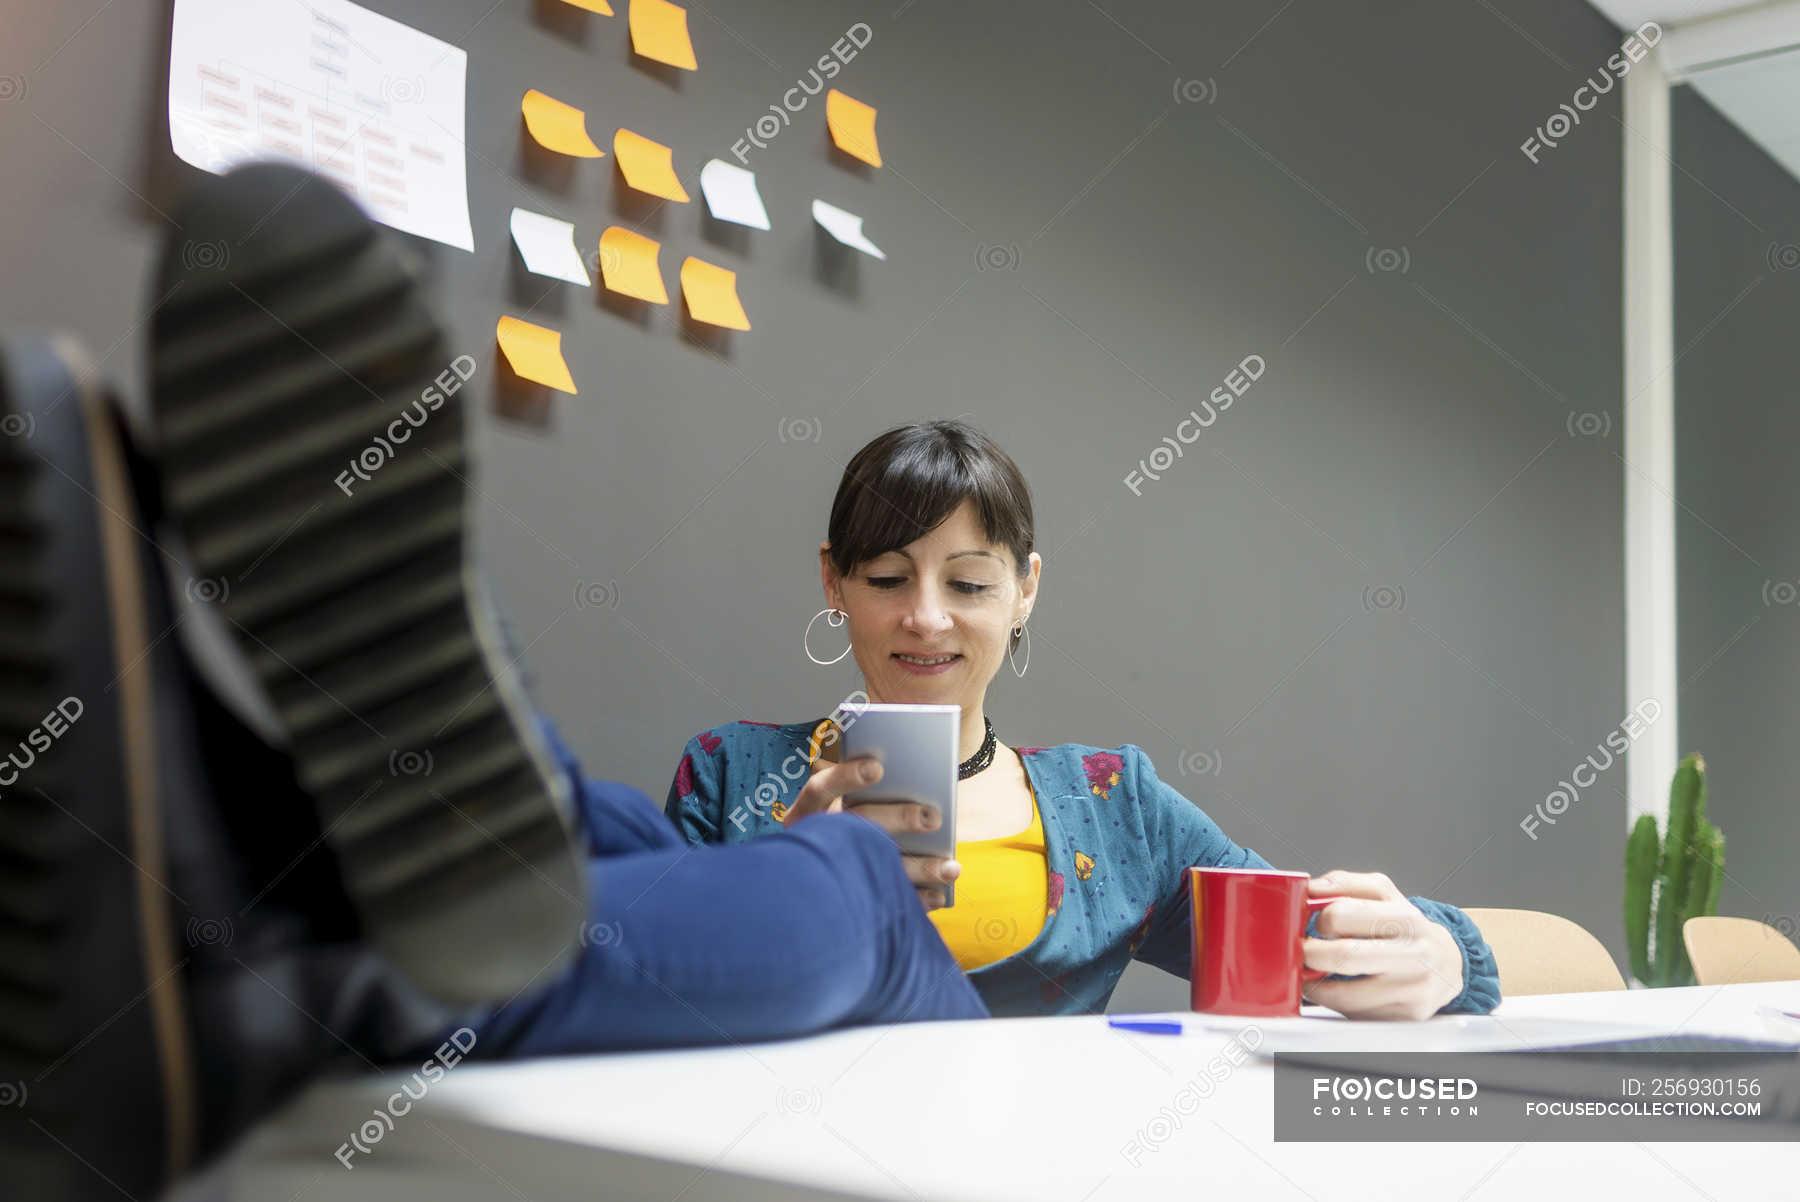 Female Manager With Mug Of Hot Beverage